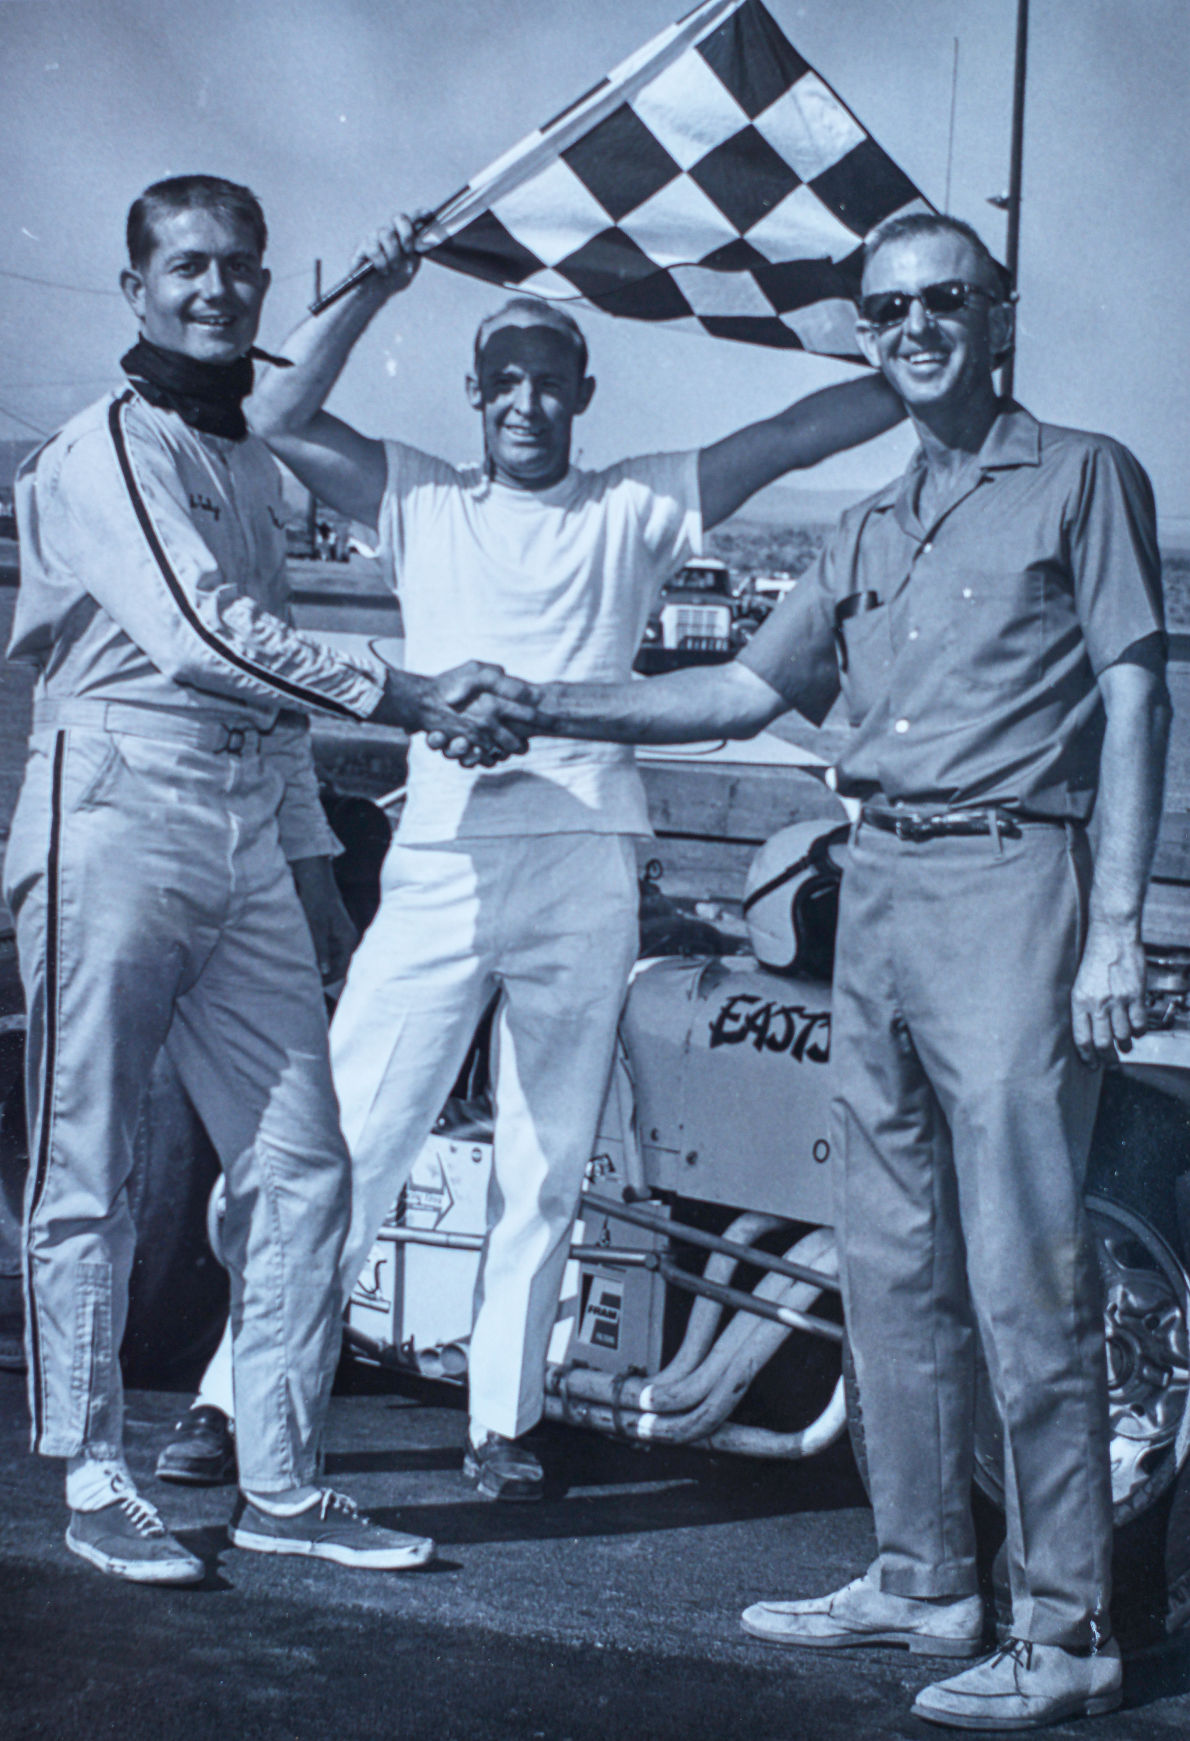 Kik Family Racing